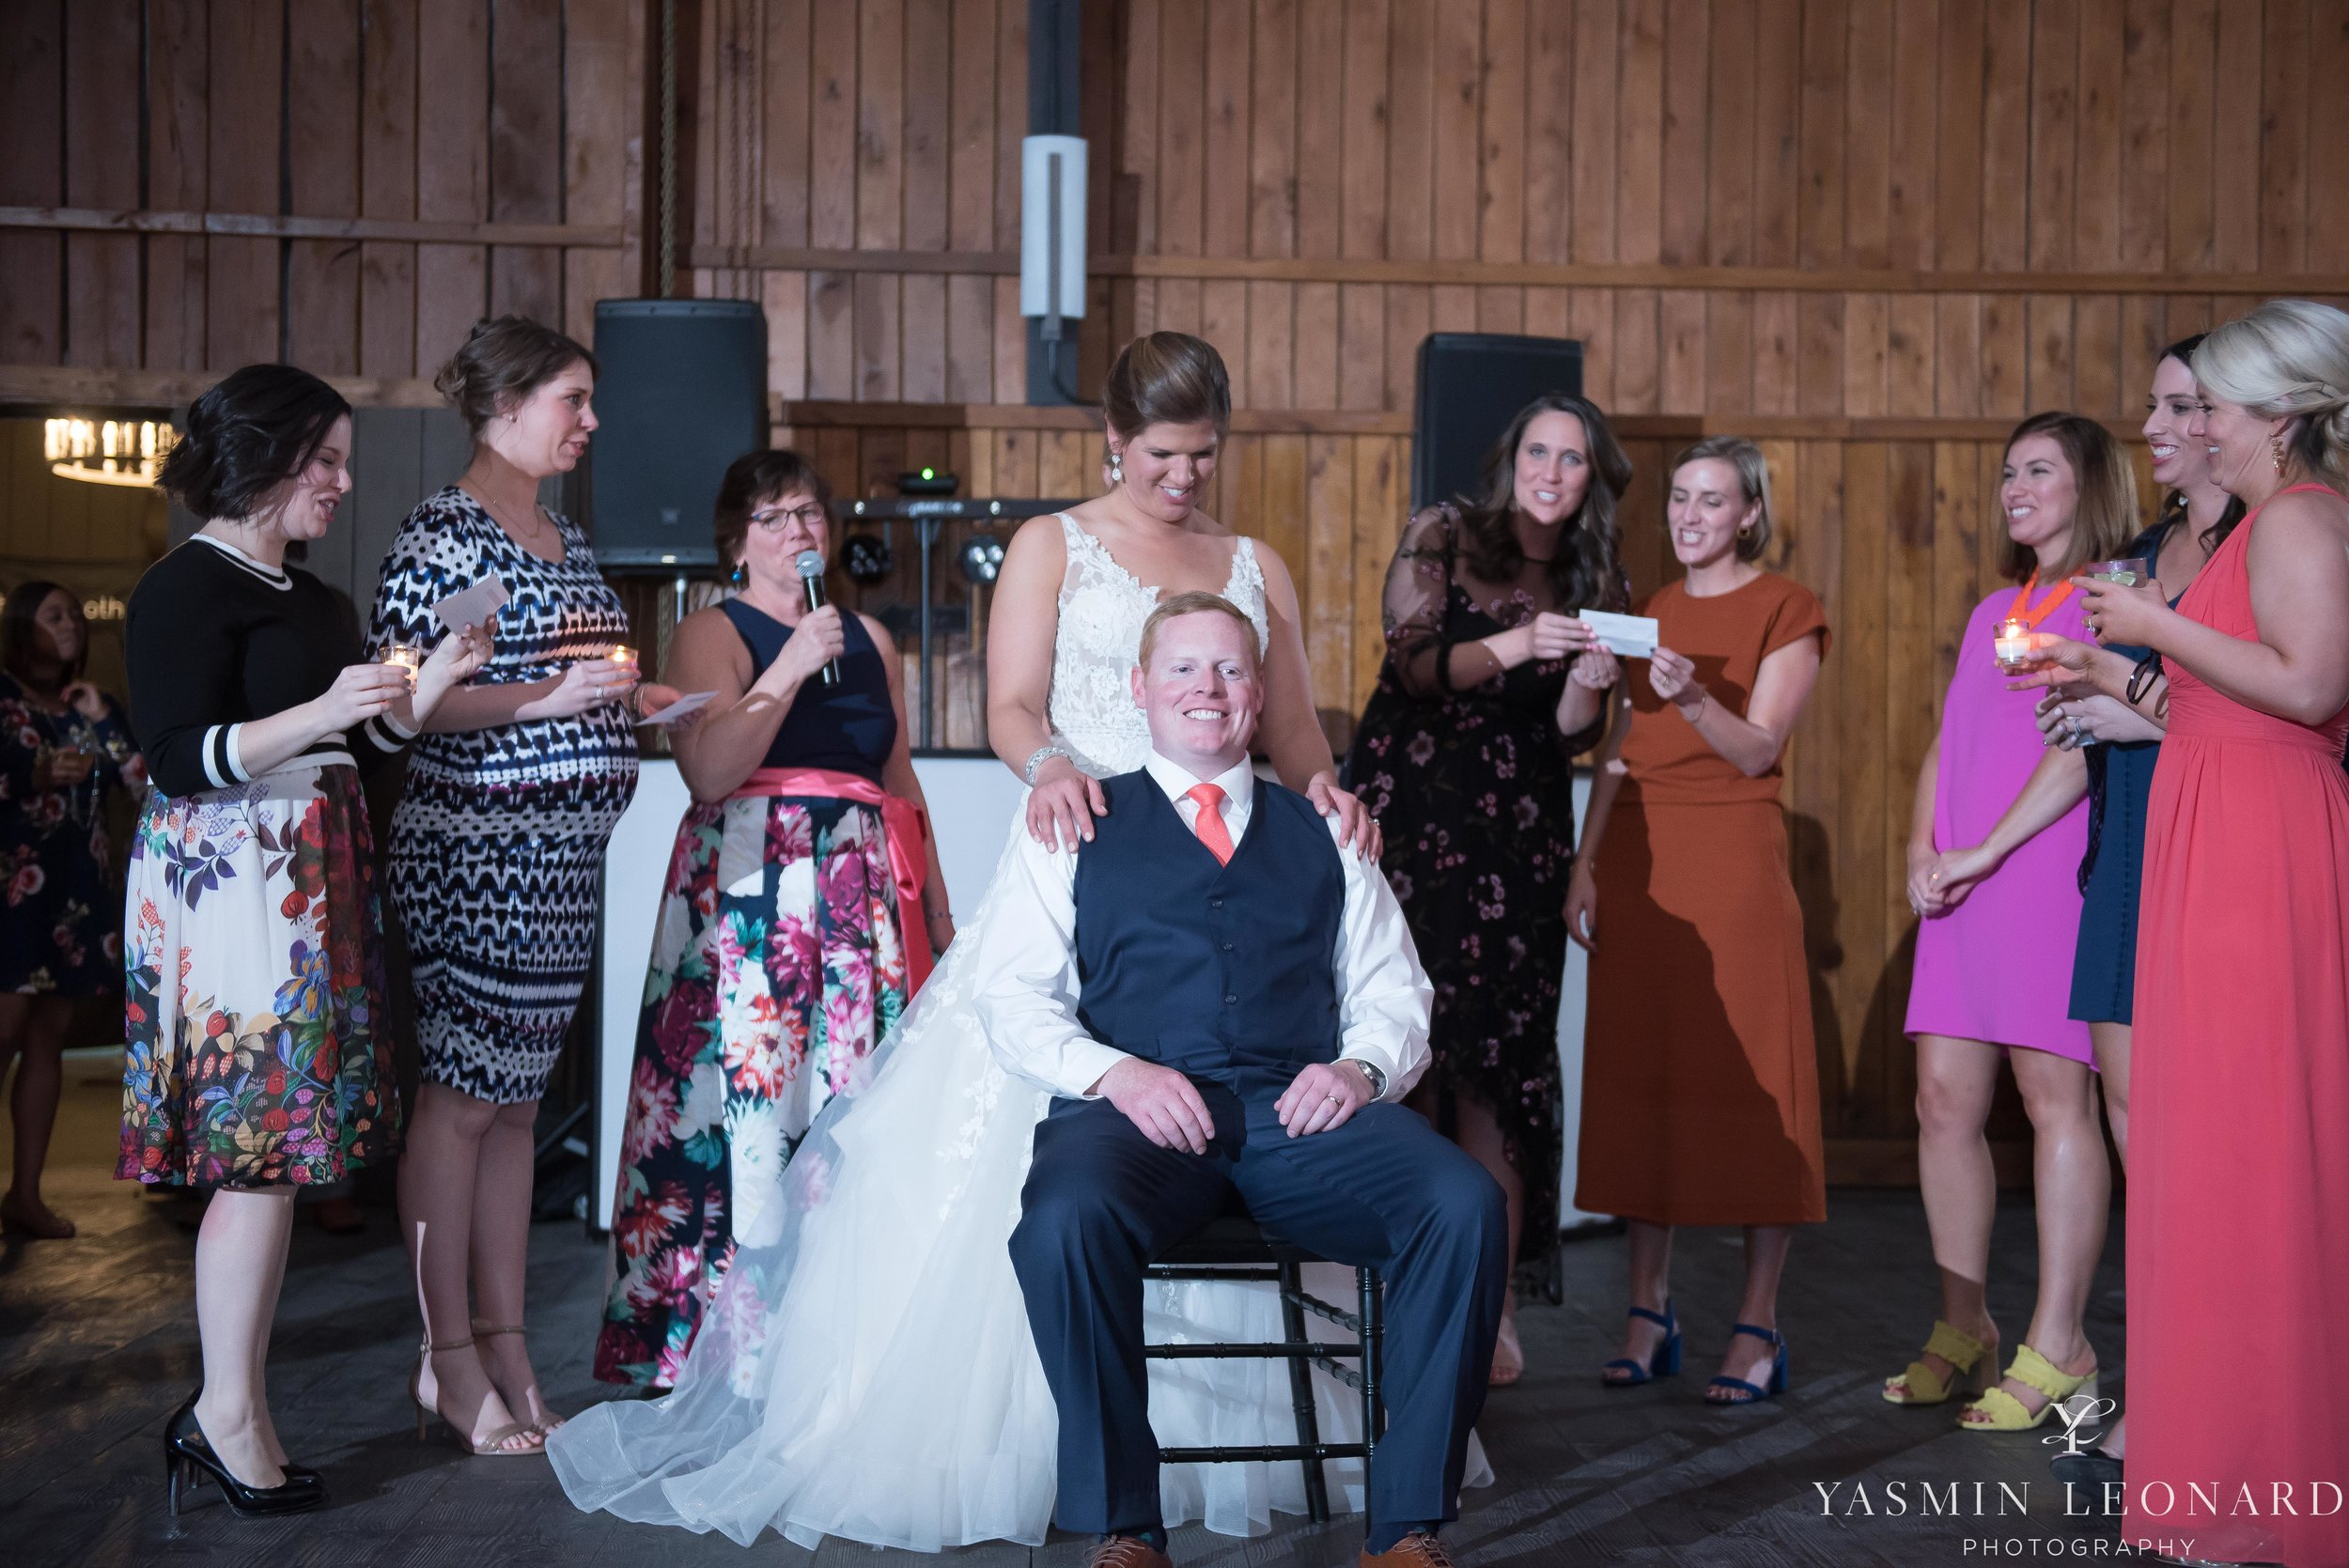 Adaumont Farm - Adaumont Farm Weddings - Trinity Weddings - NC Weddings - Yasmin Leonard Photography-84.jpg